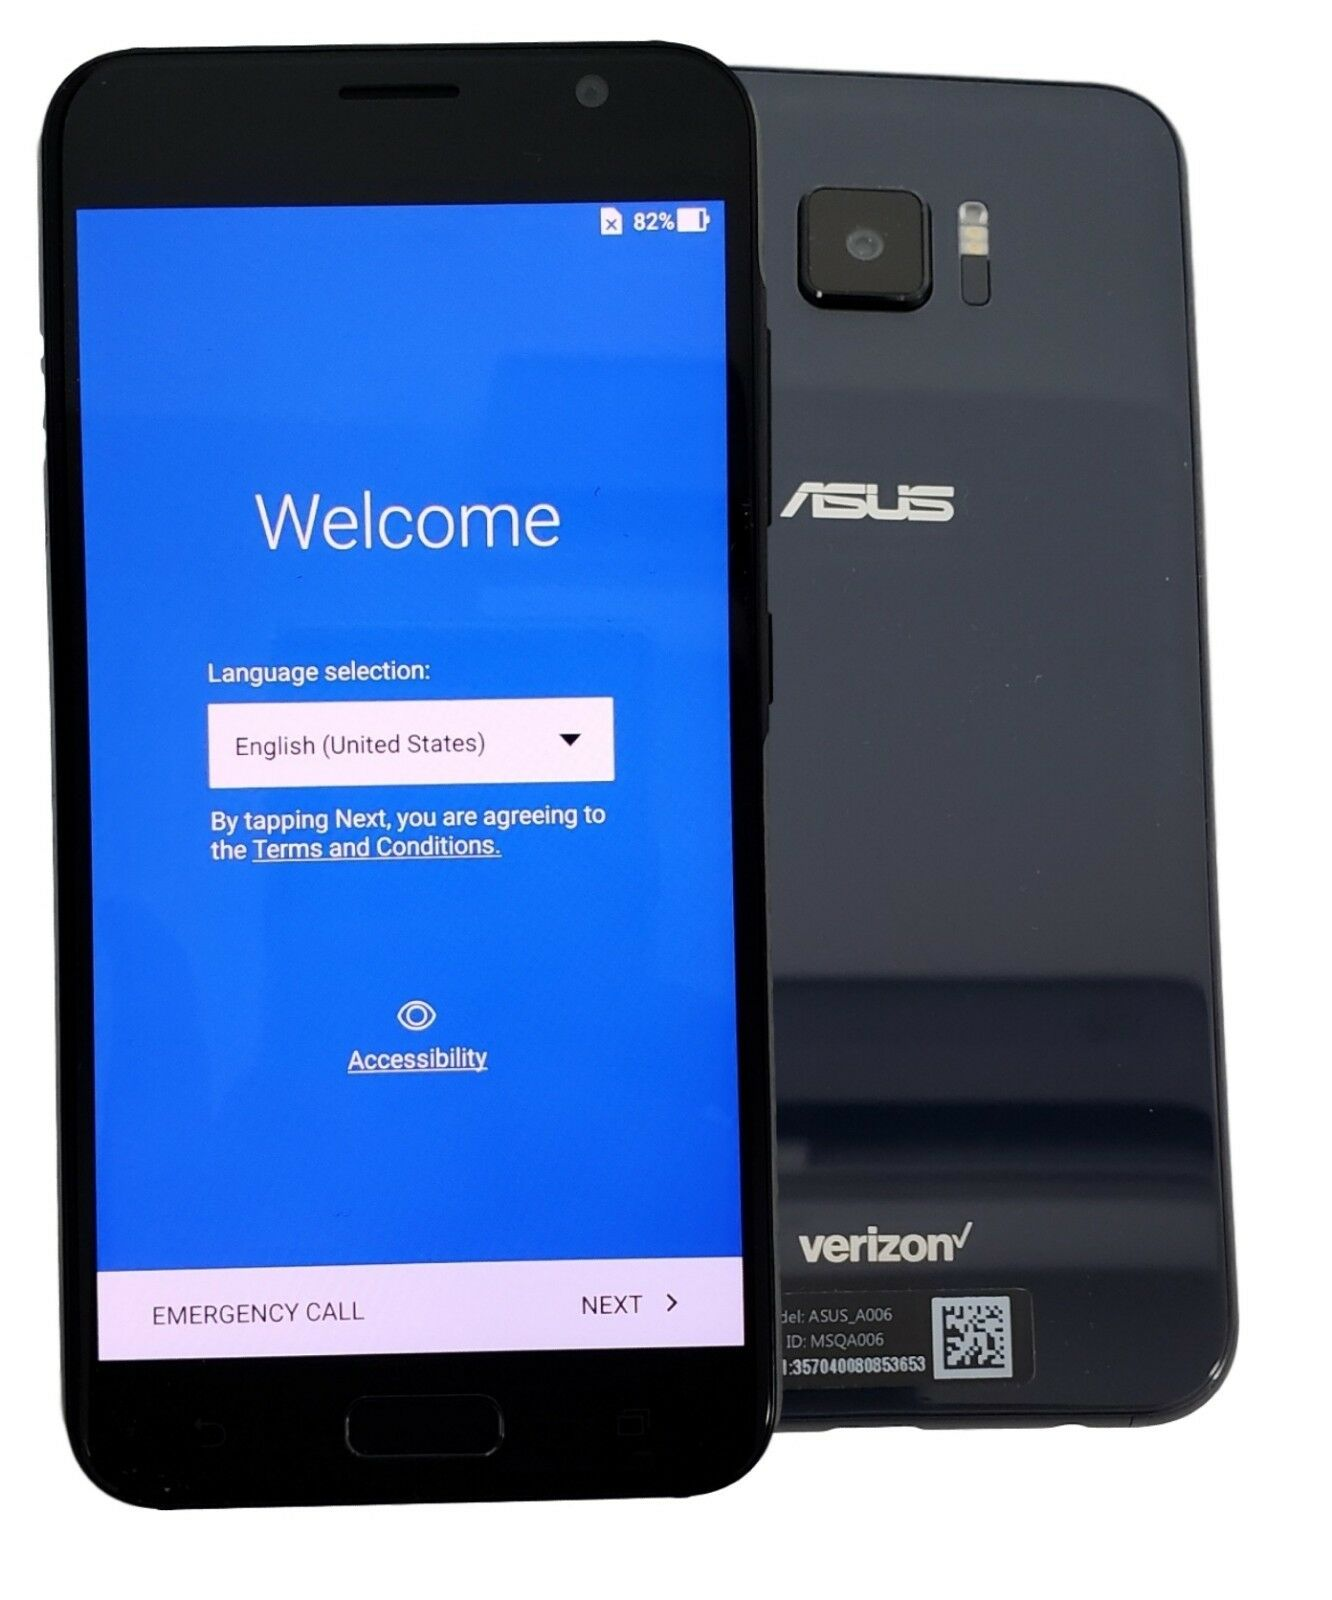 Android Phone - ASUS ZenFone 5 V A006 V520KL 32GB Black Verizon Unlocked Smartphone Cell Phone